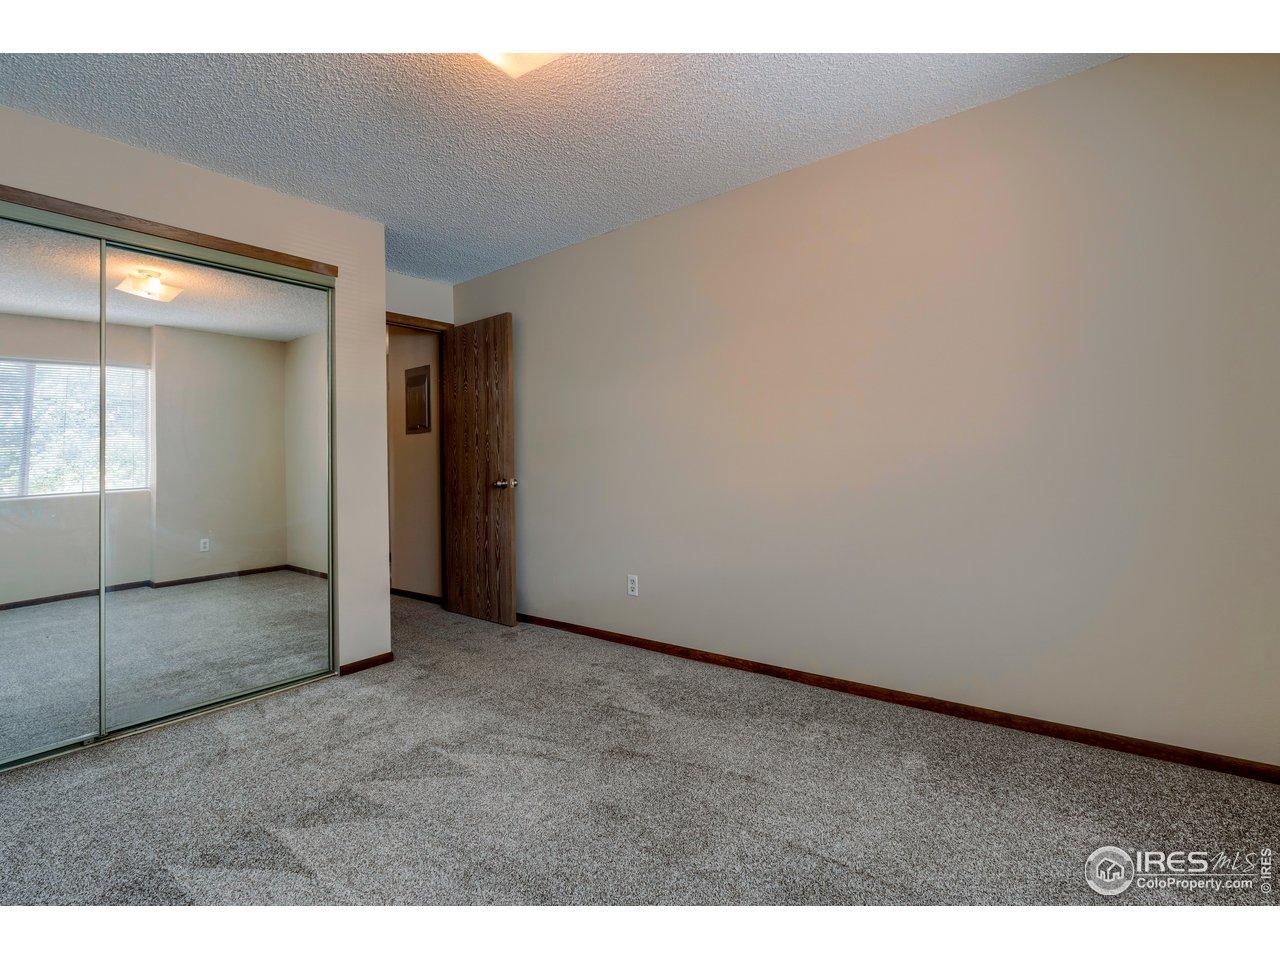 Large closet w/ mirrored doors